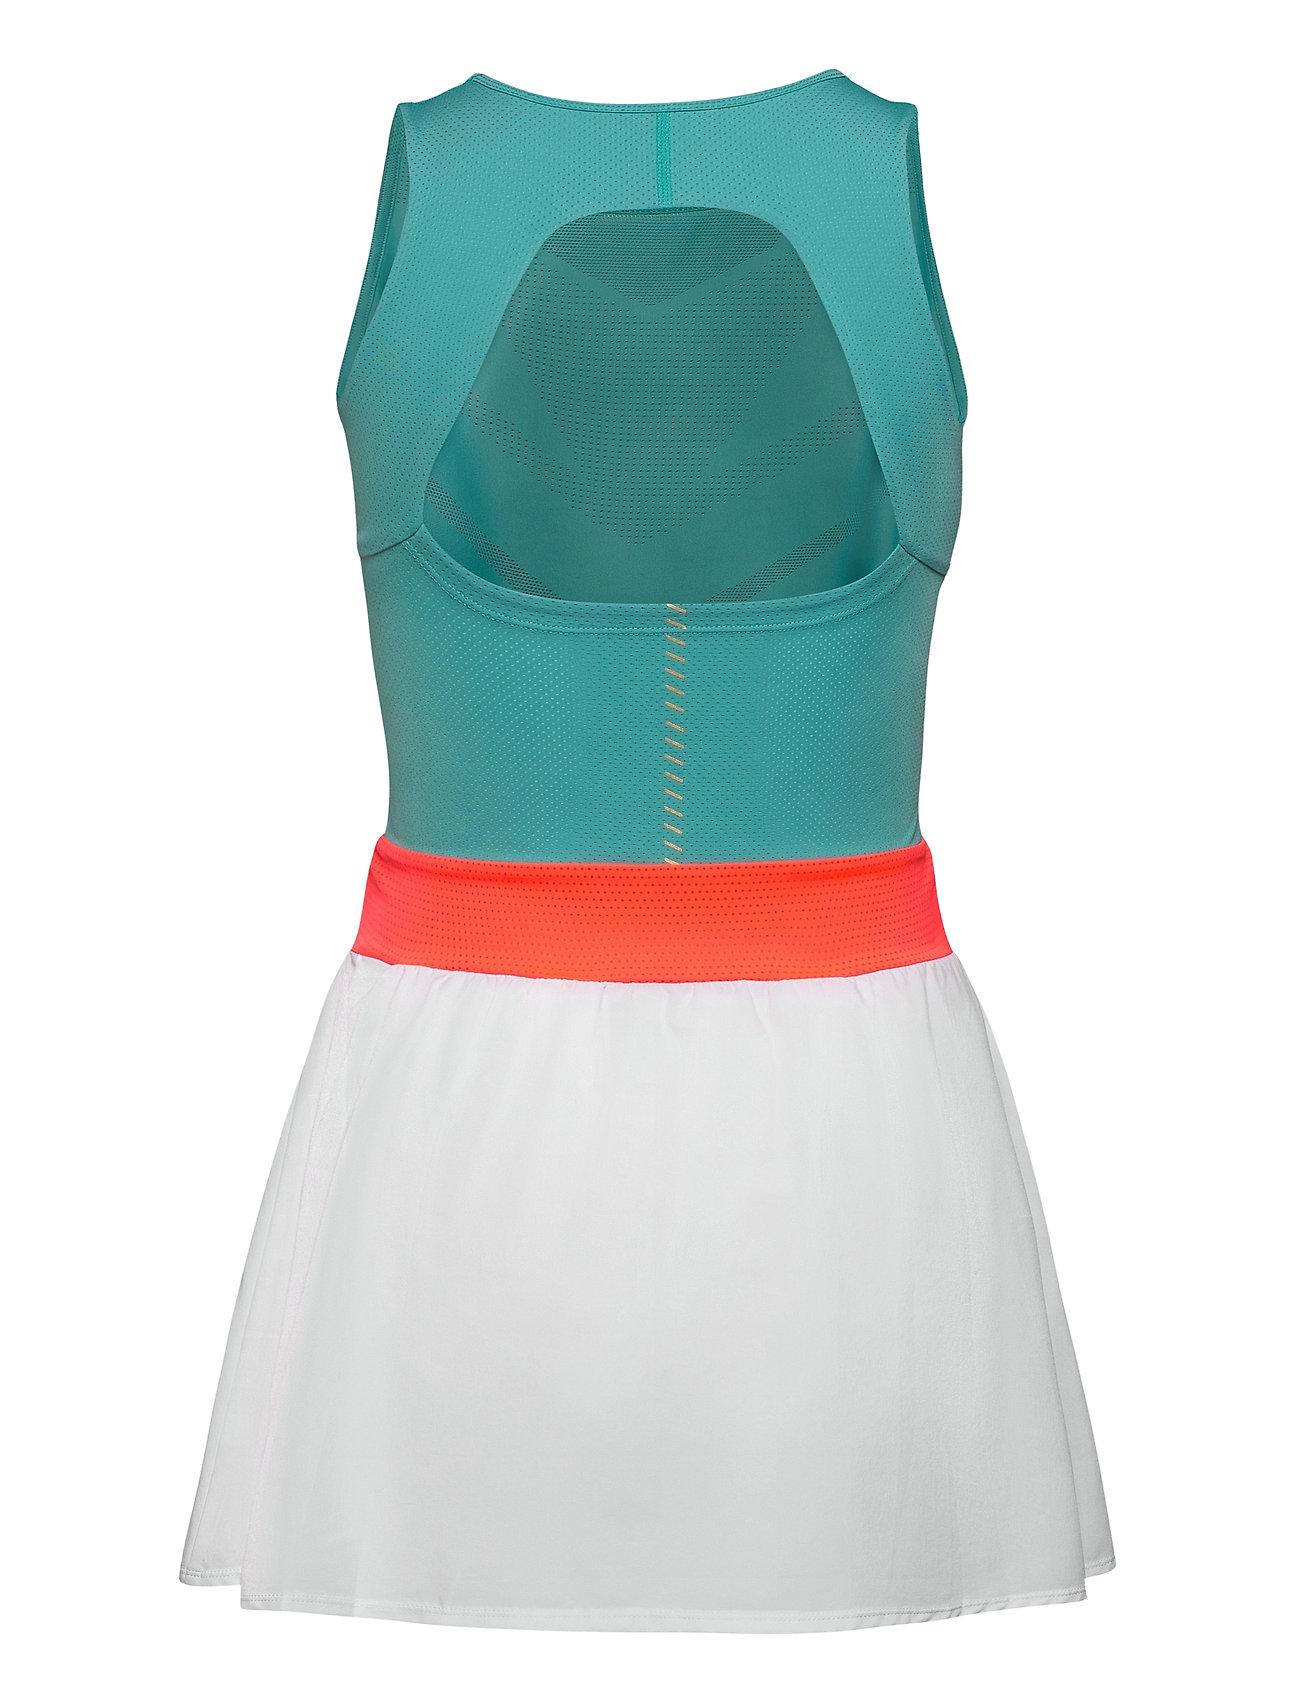 ASICS Kleider | Tennis W Dress Kurzes Kleid Grün ASICS